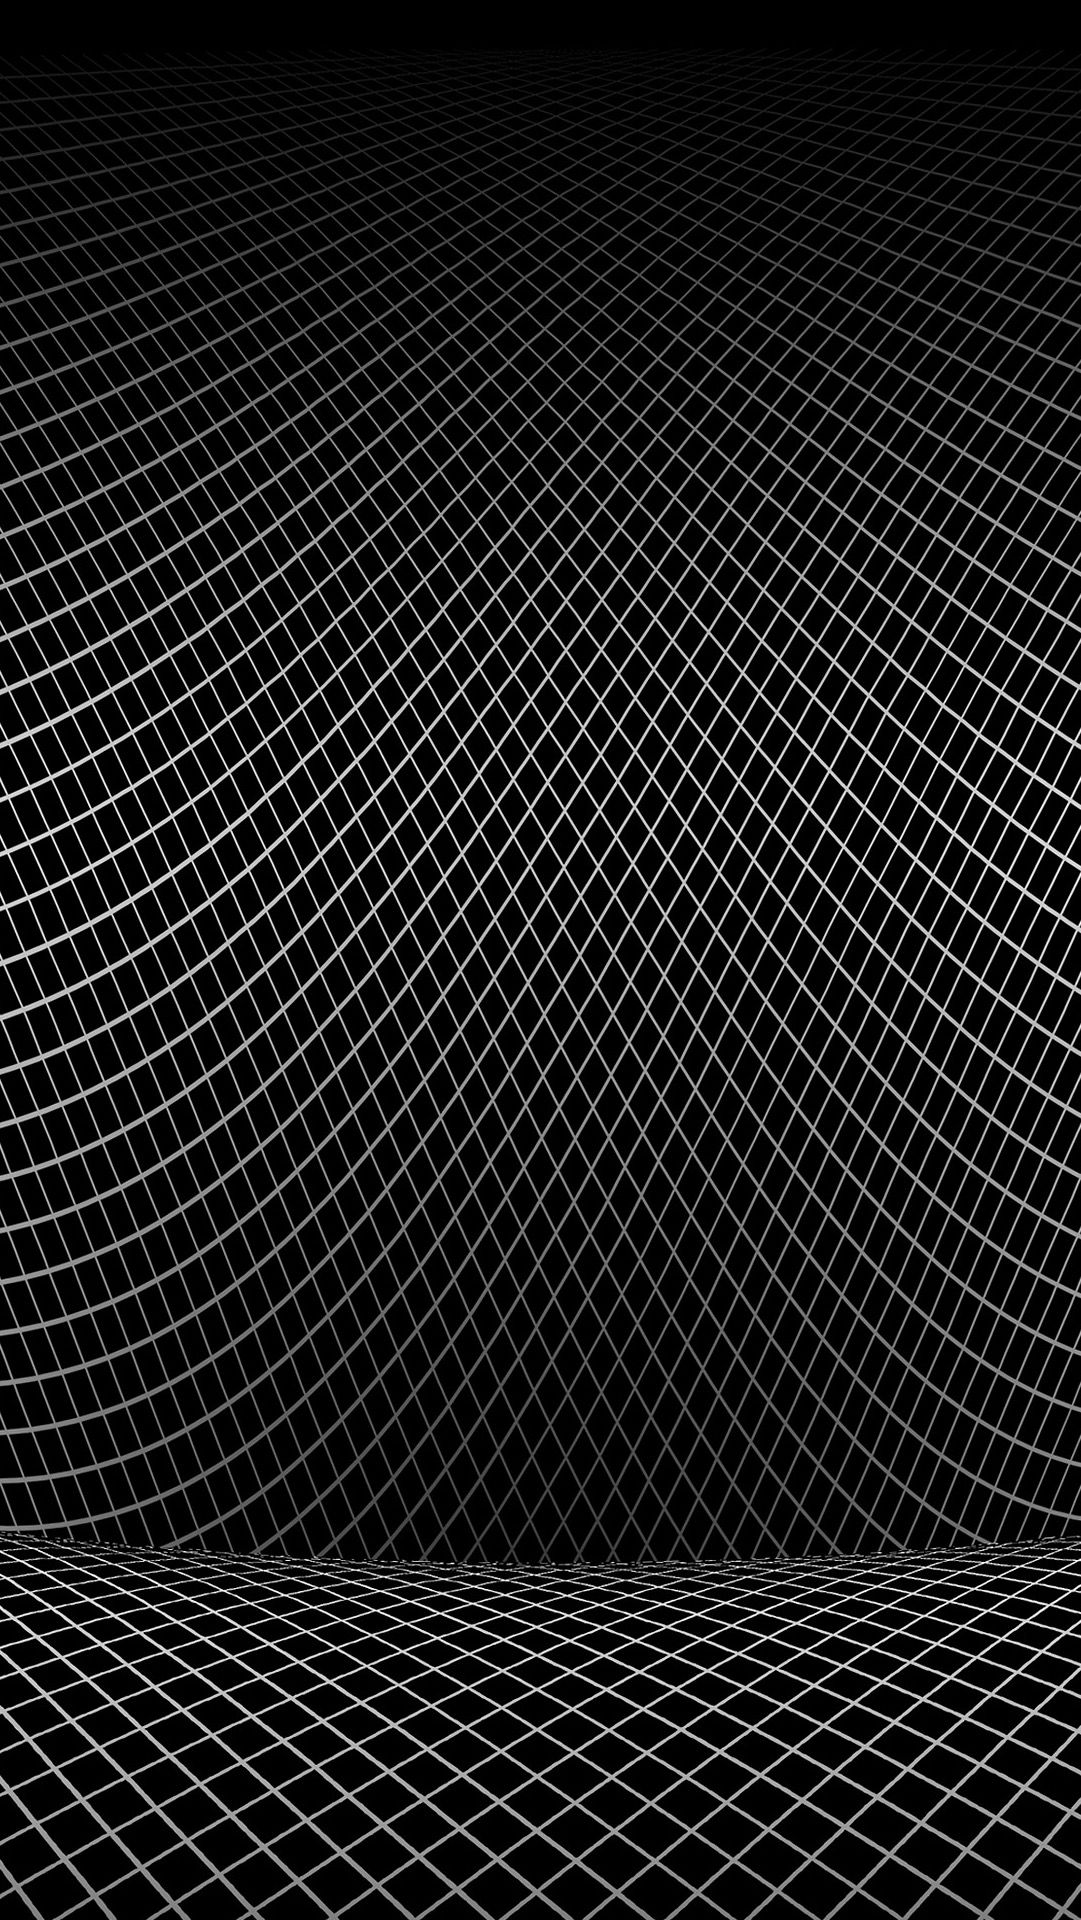 Tap And Get The Free App Lockscreens Stylish Black Metallic Net Texture Simple Minimalistic Hd Iphone Samsung Wallpaper Cellphone Wallpaper Phone Wallpaper